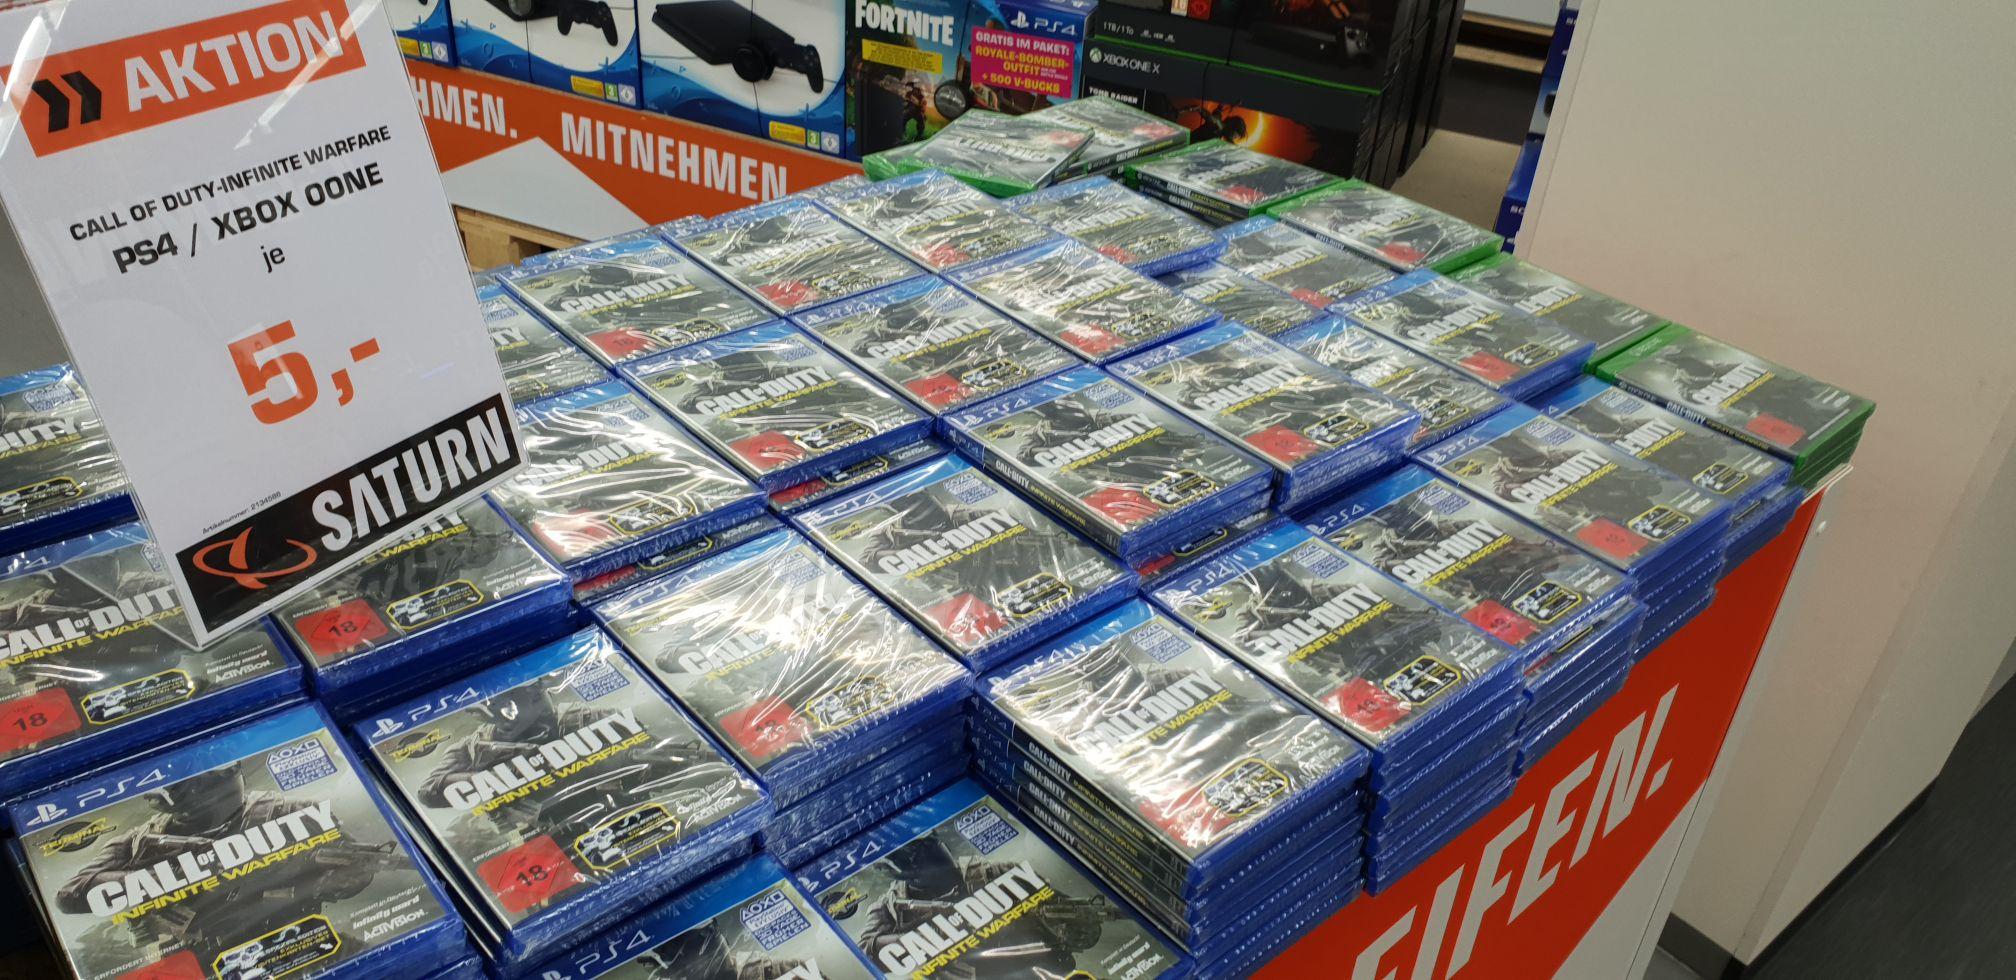 [Lokal Berlin] Saturn Europacenter - Call of Duty Infinite Warfare  PS4 und XBOX ONE